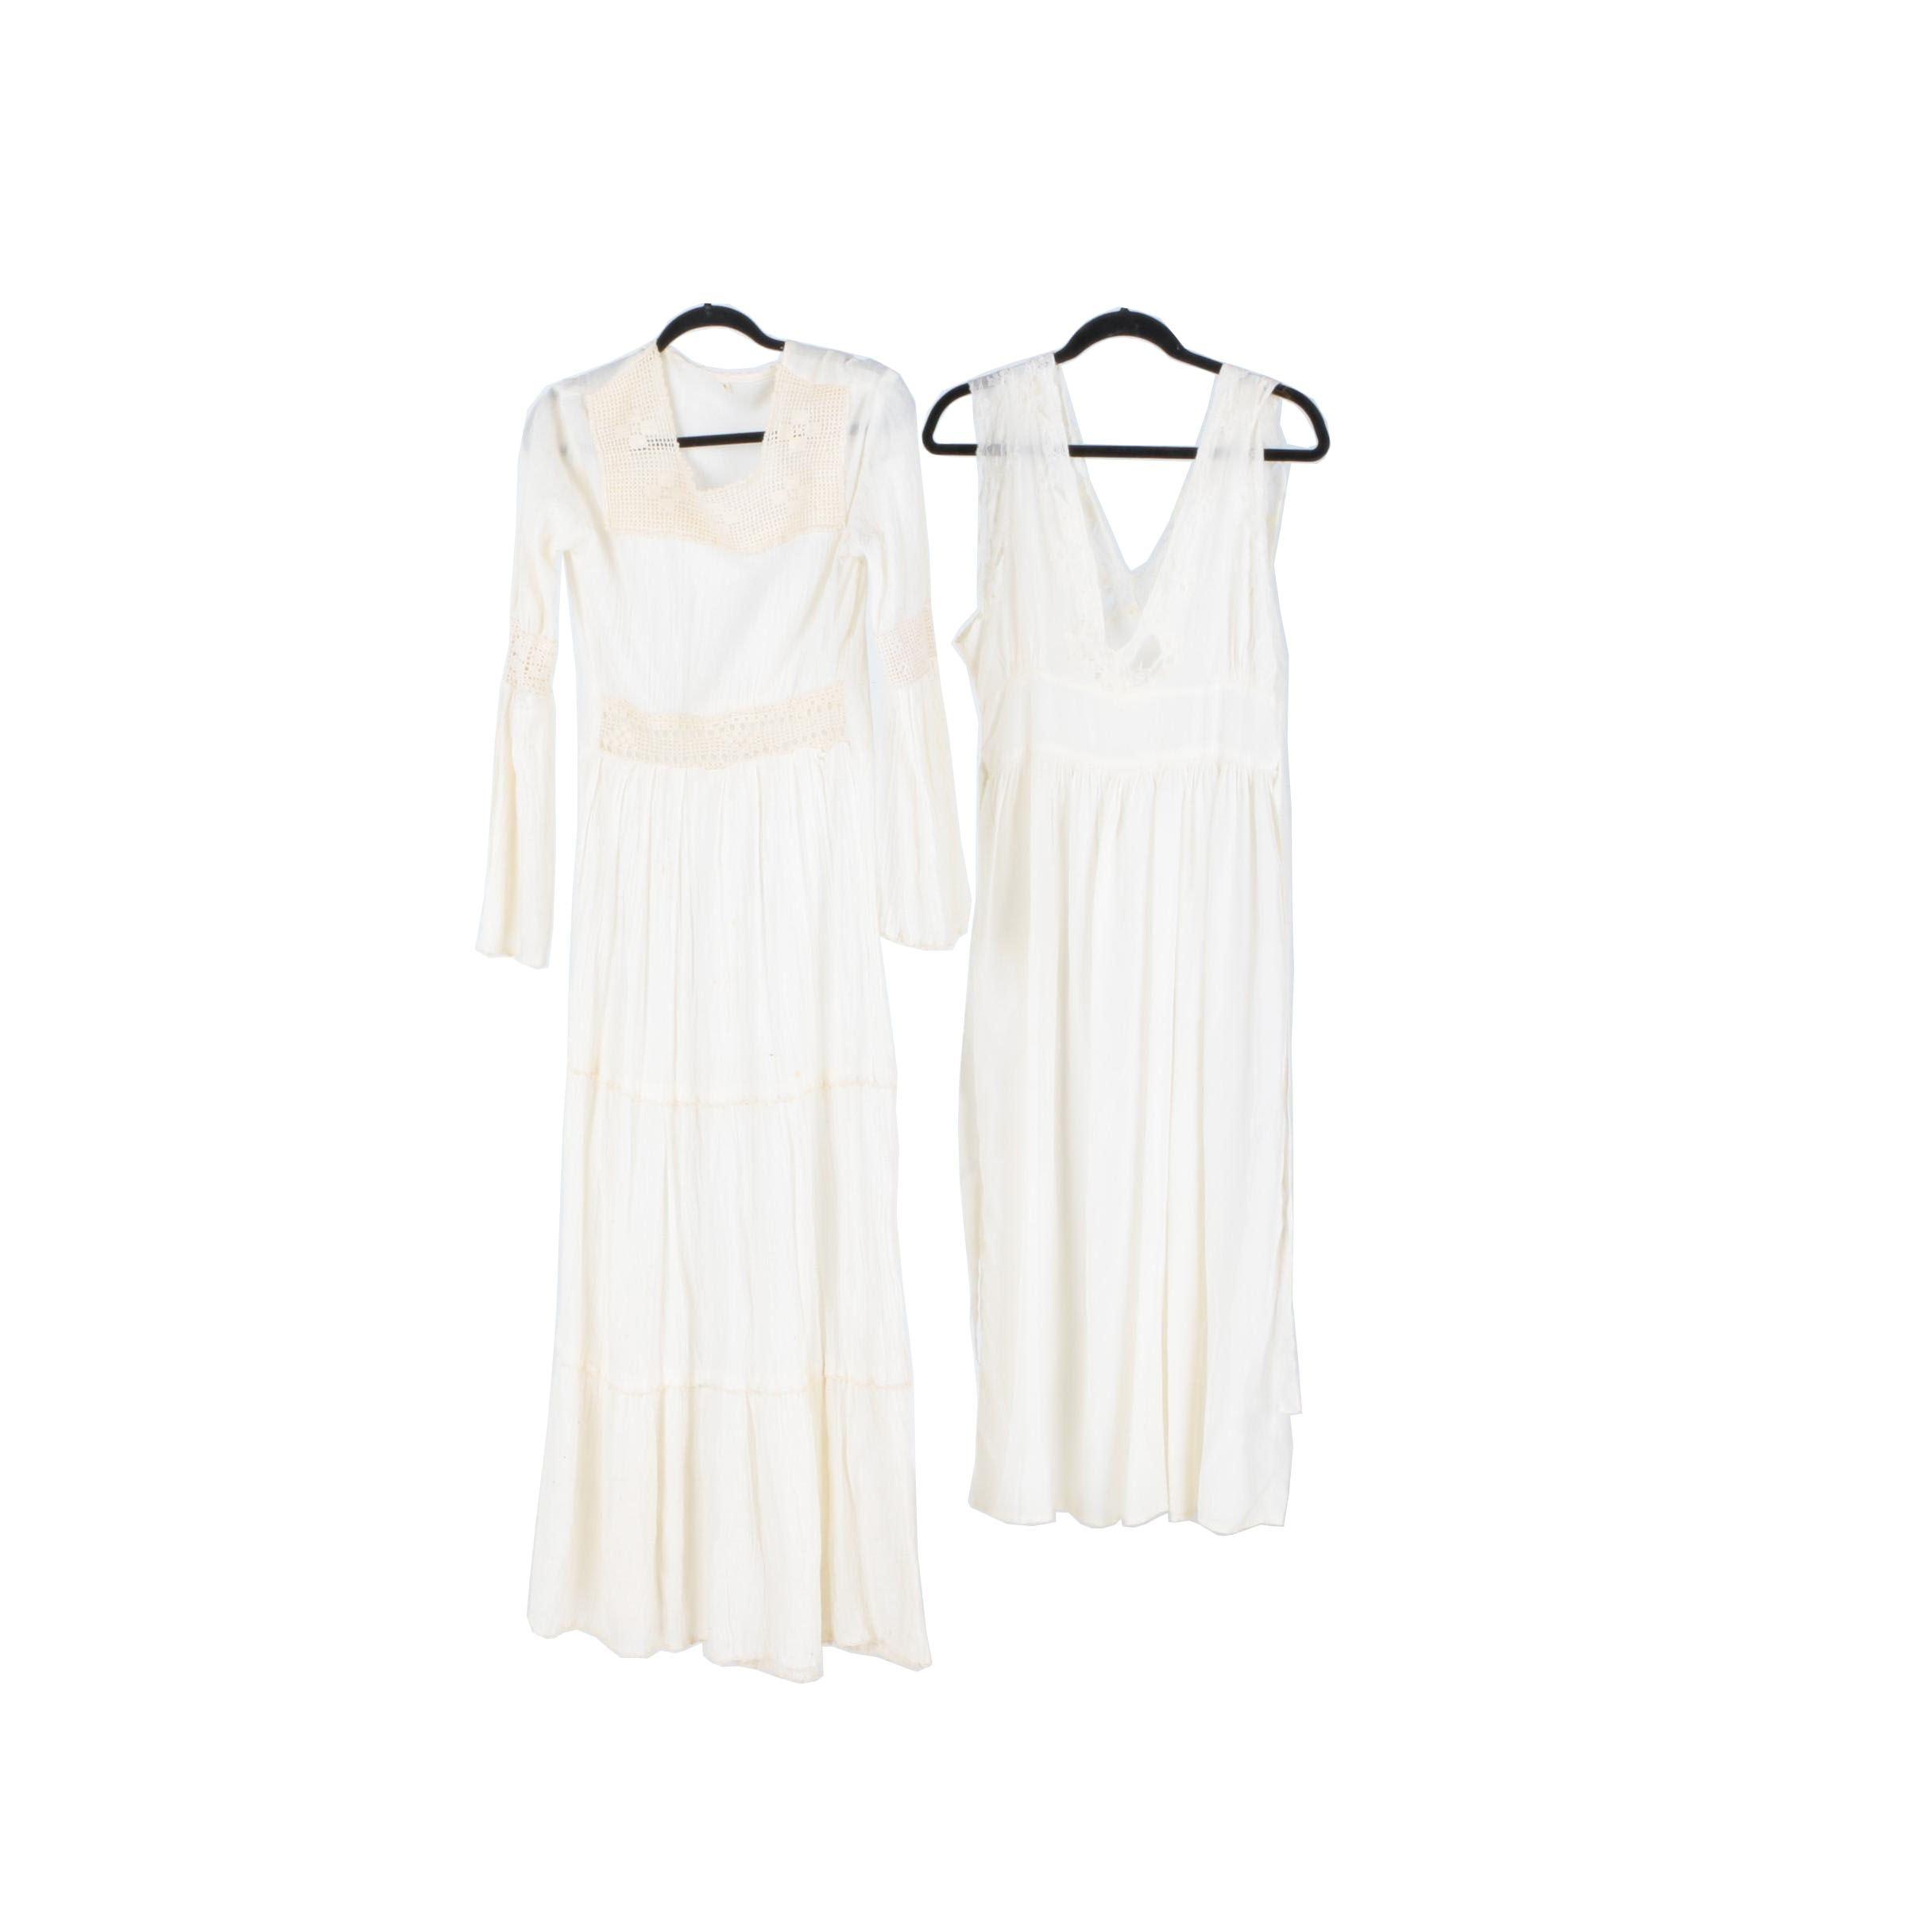 Vintage Bohemian Style Dresses